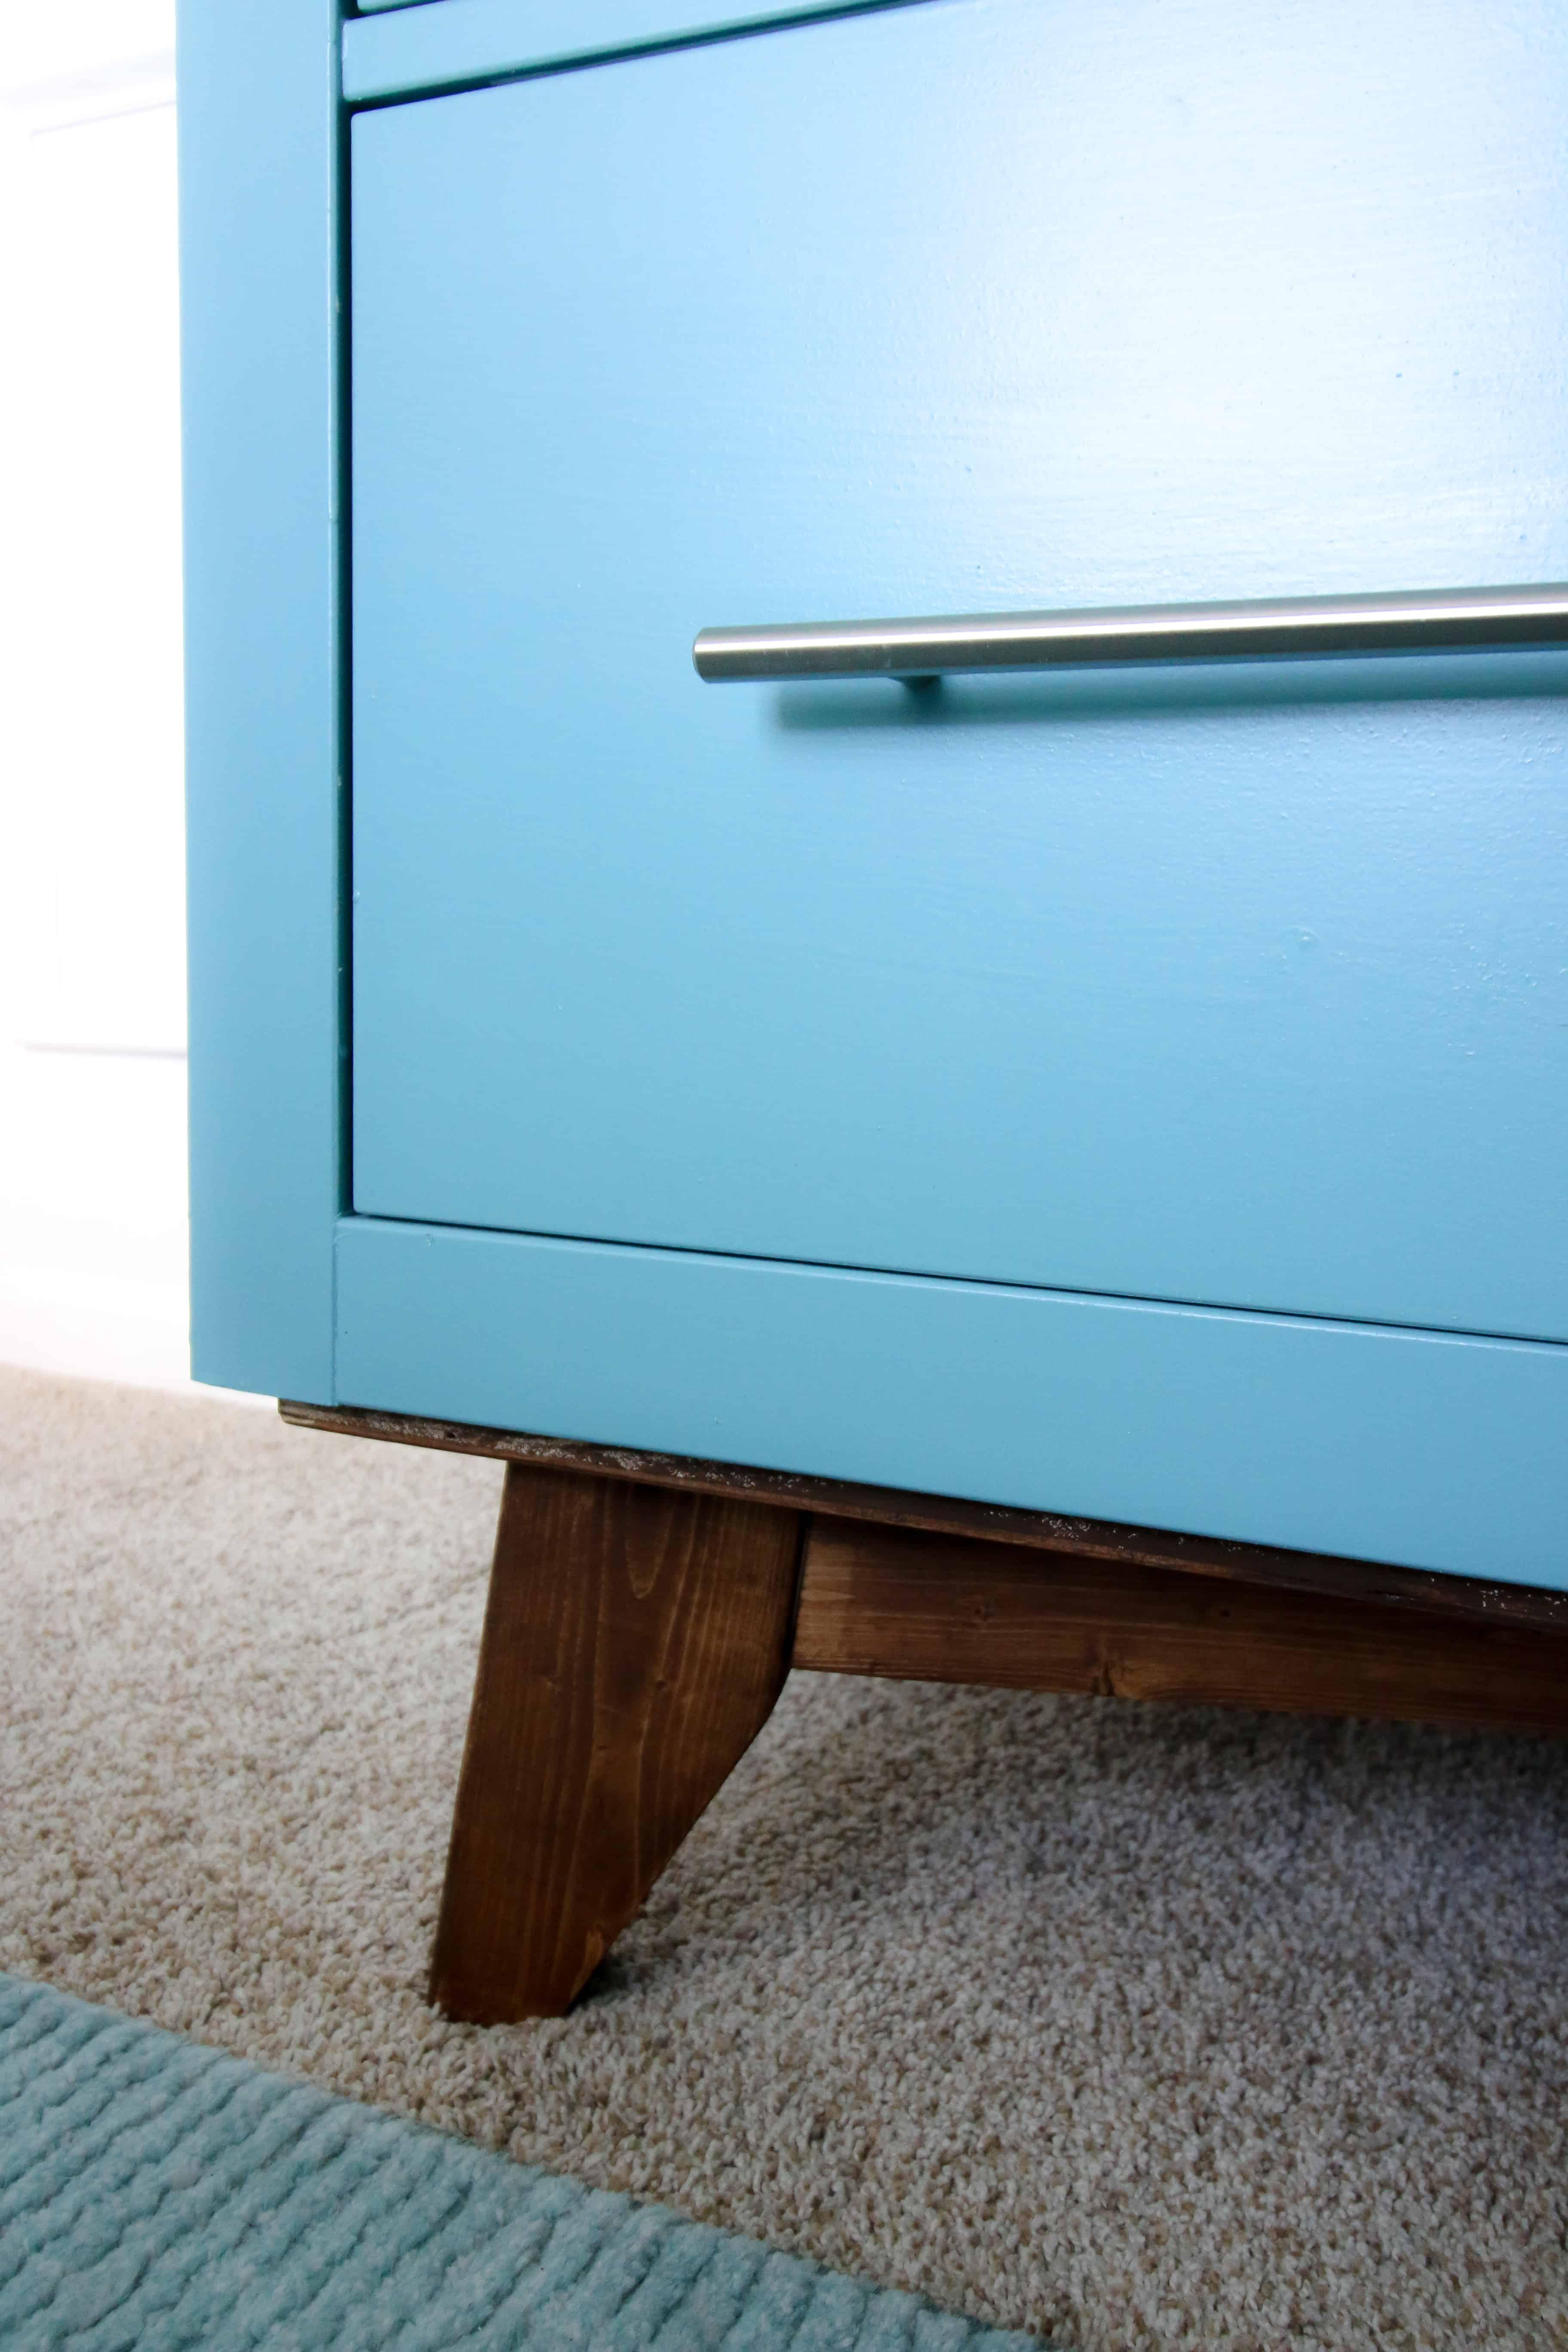 IKEA Hemnes Dresser Mid Century Modern Hack - MCM legs from 2x4s